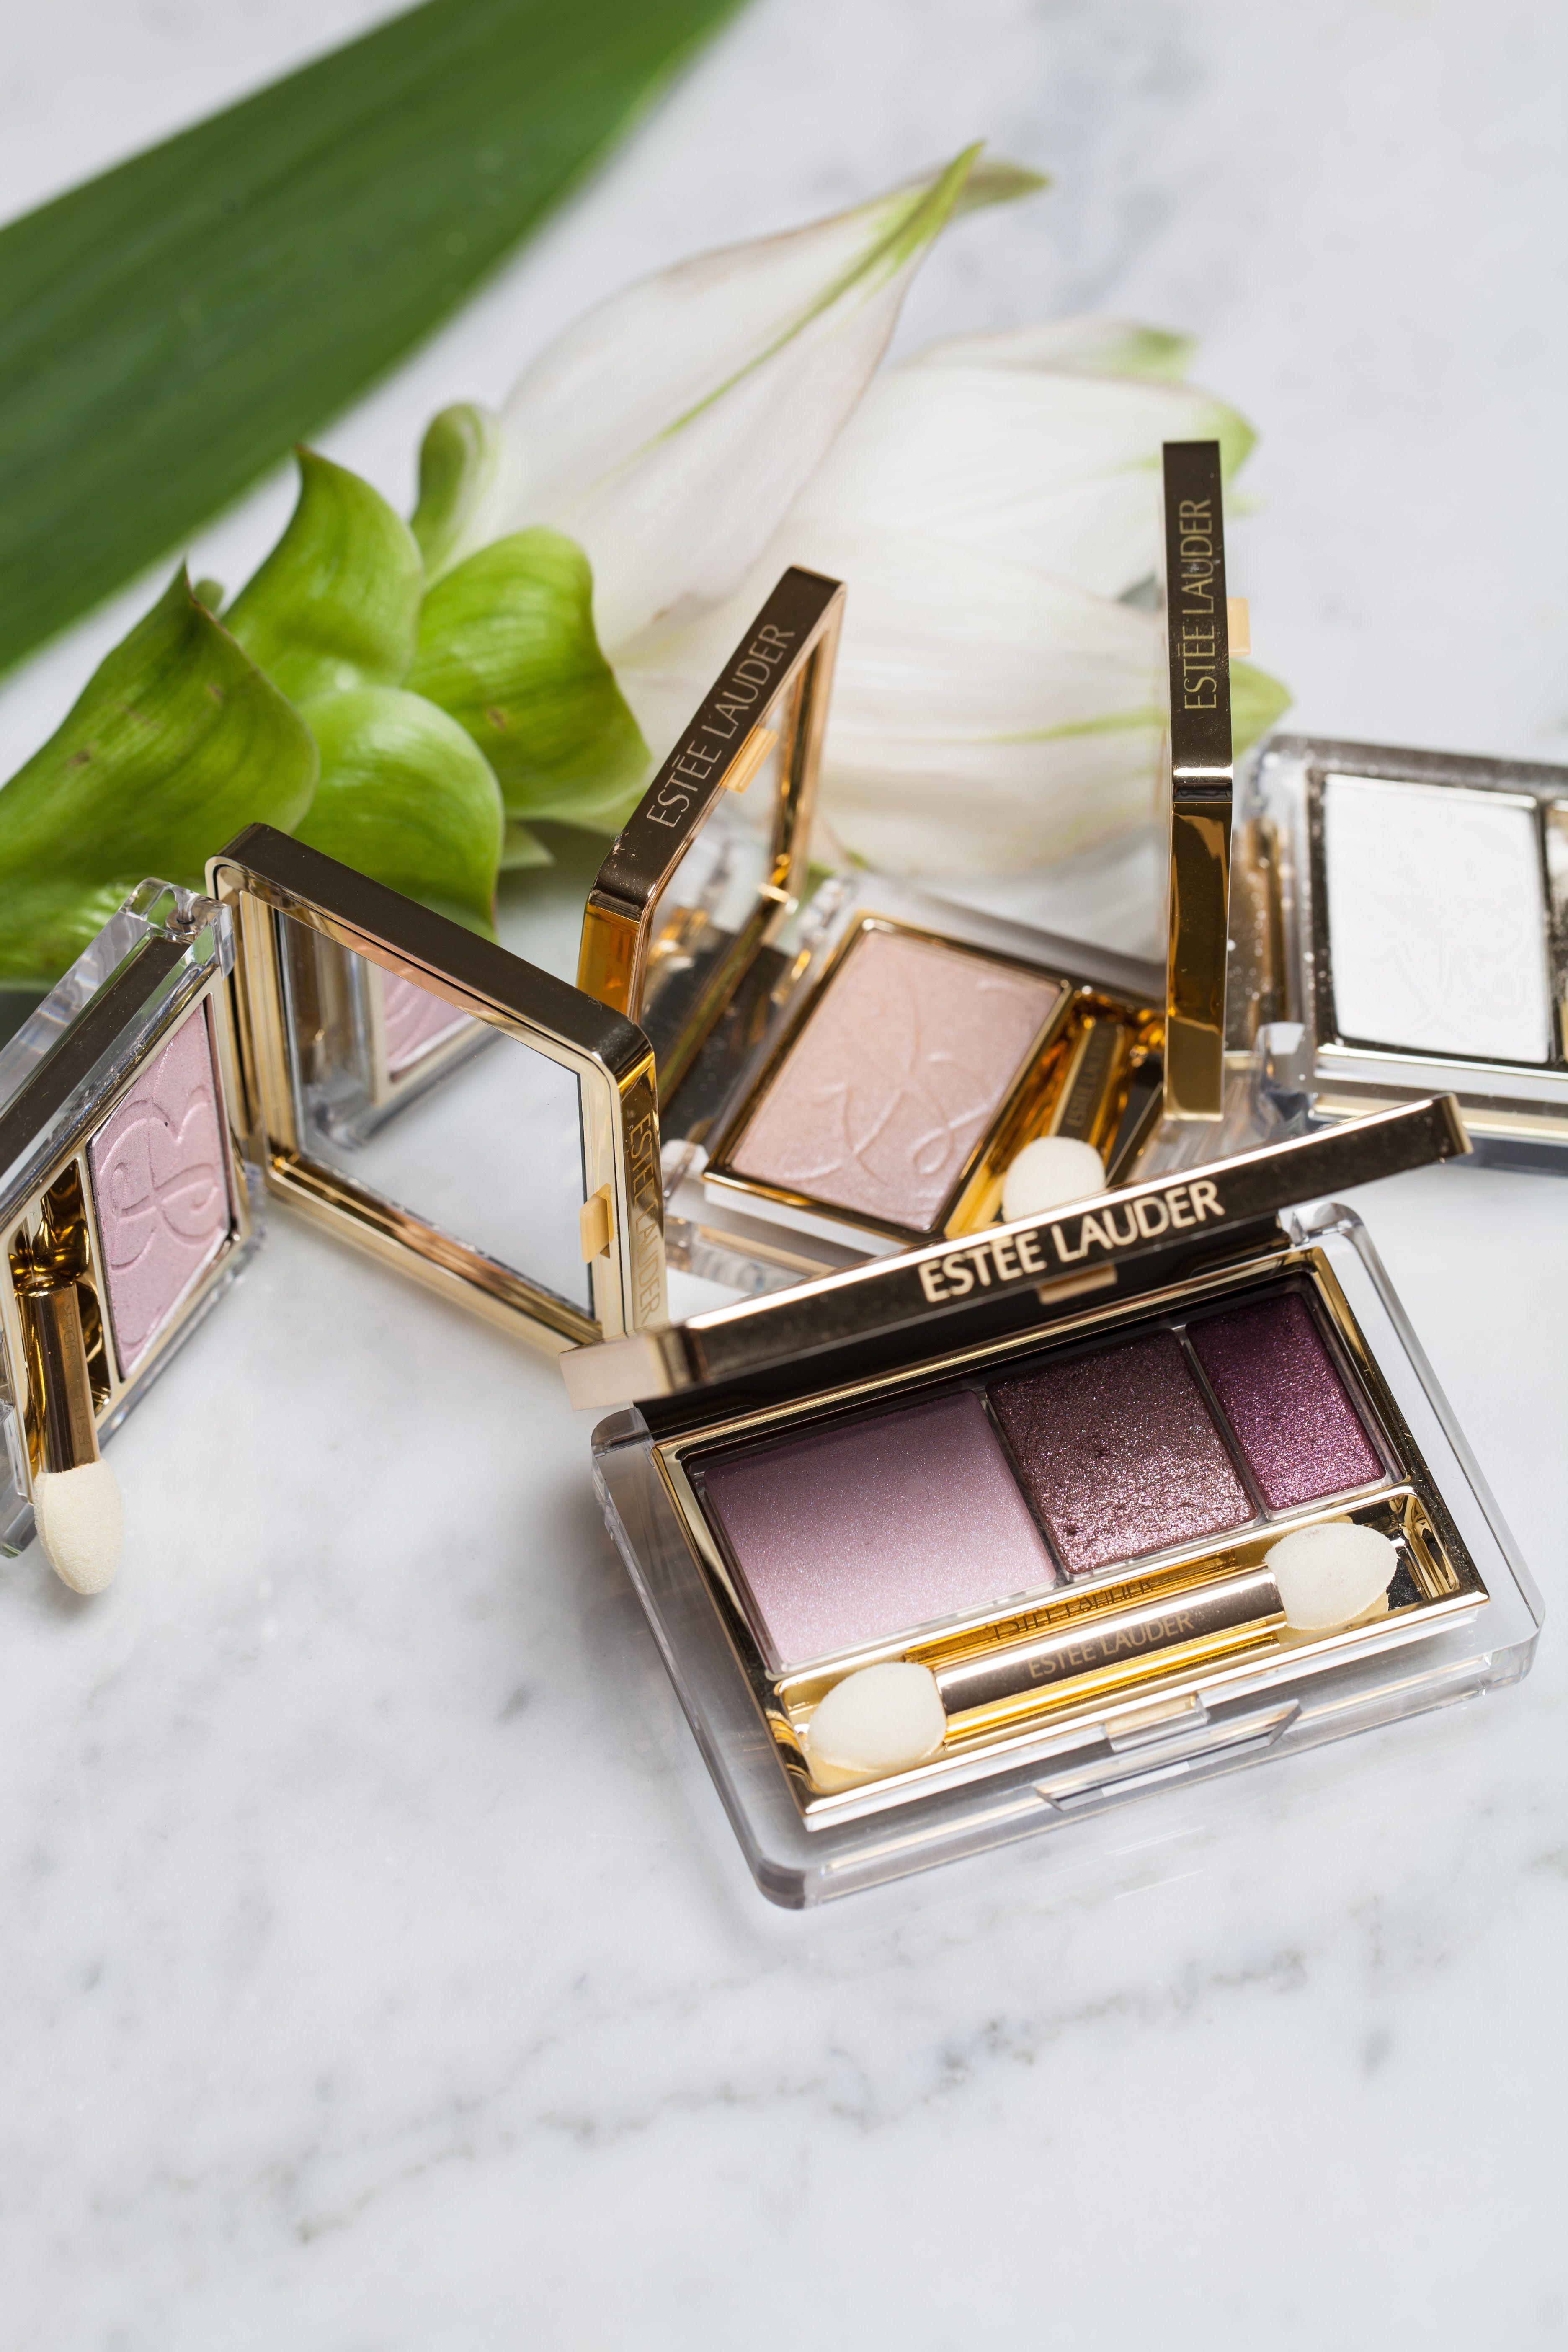 Estée Lauder Official Site Intense eyeshadow, Luxury